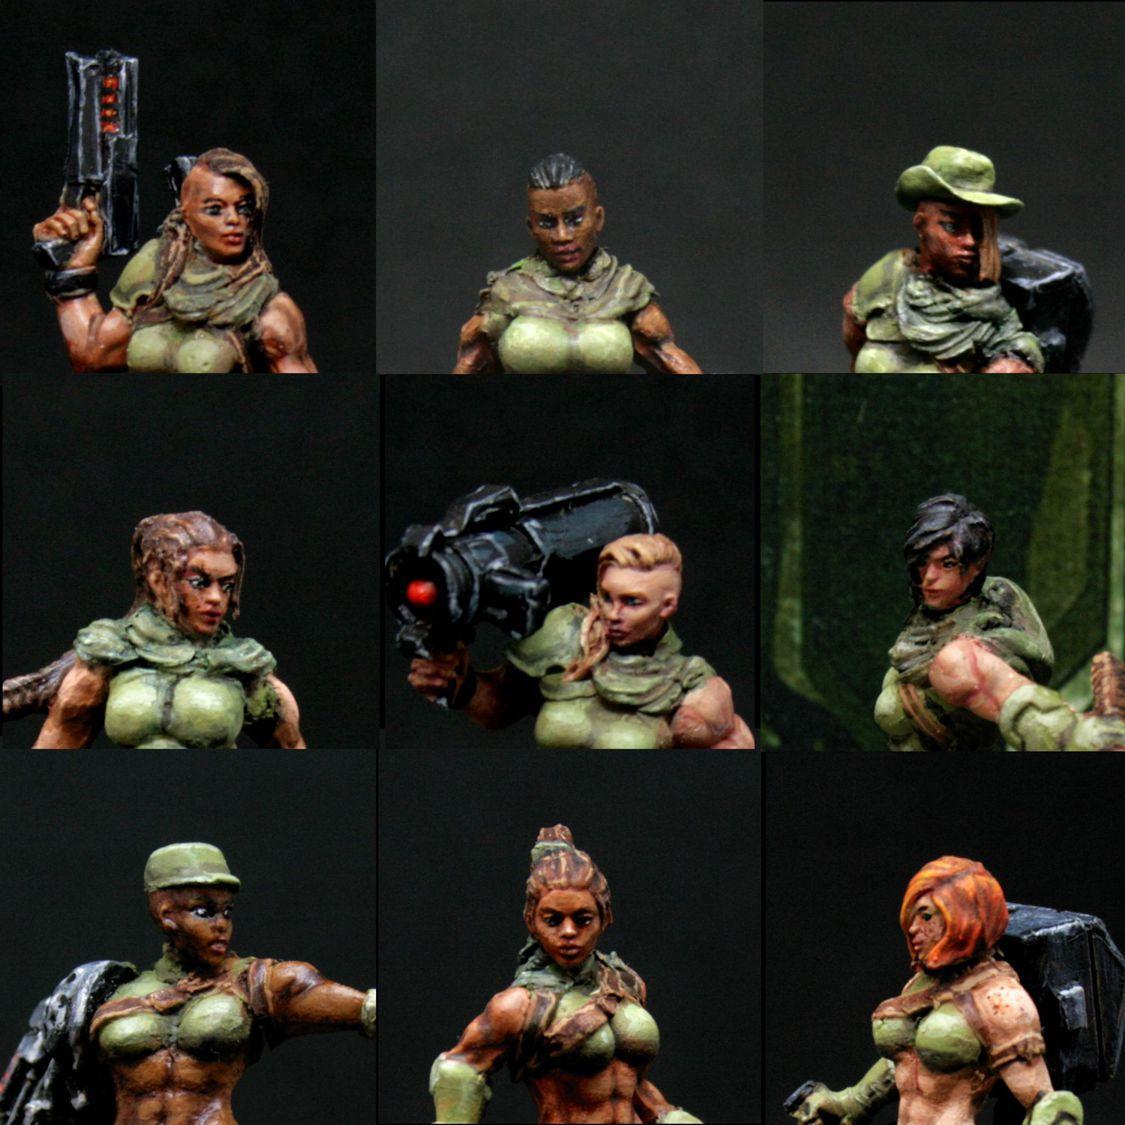 Alienhunter, Catachan, Conversion, Face, Female, Junglefighter